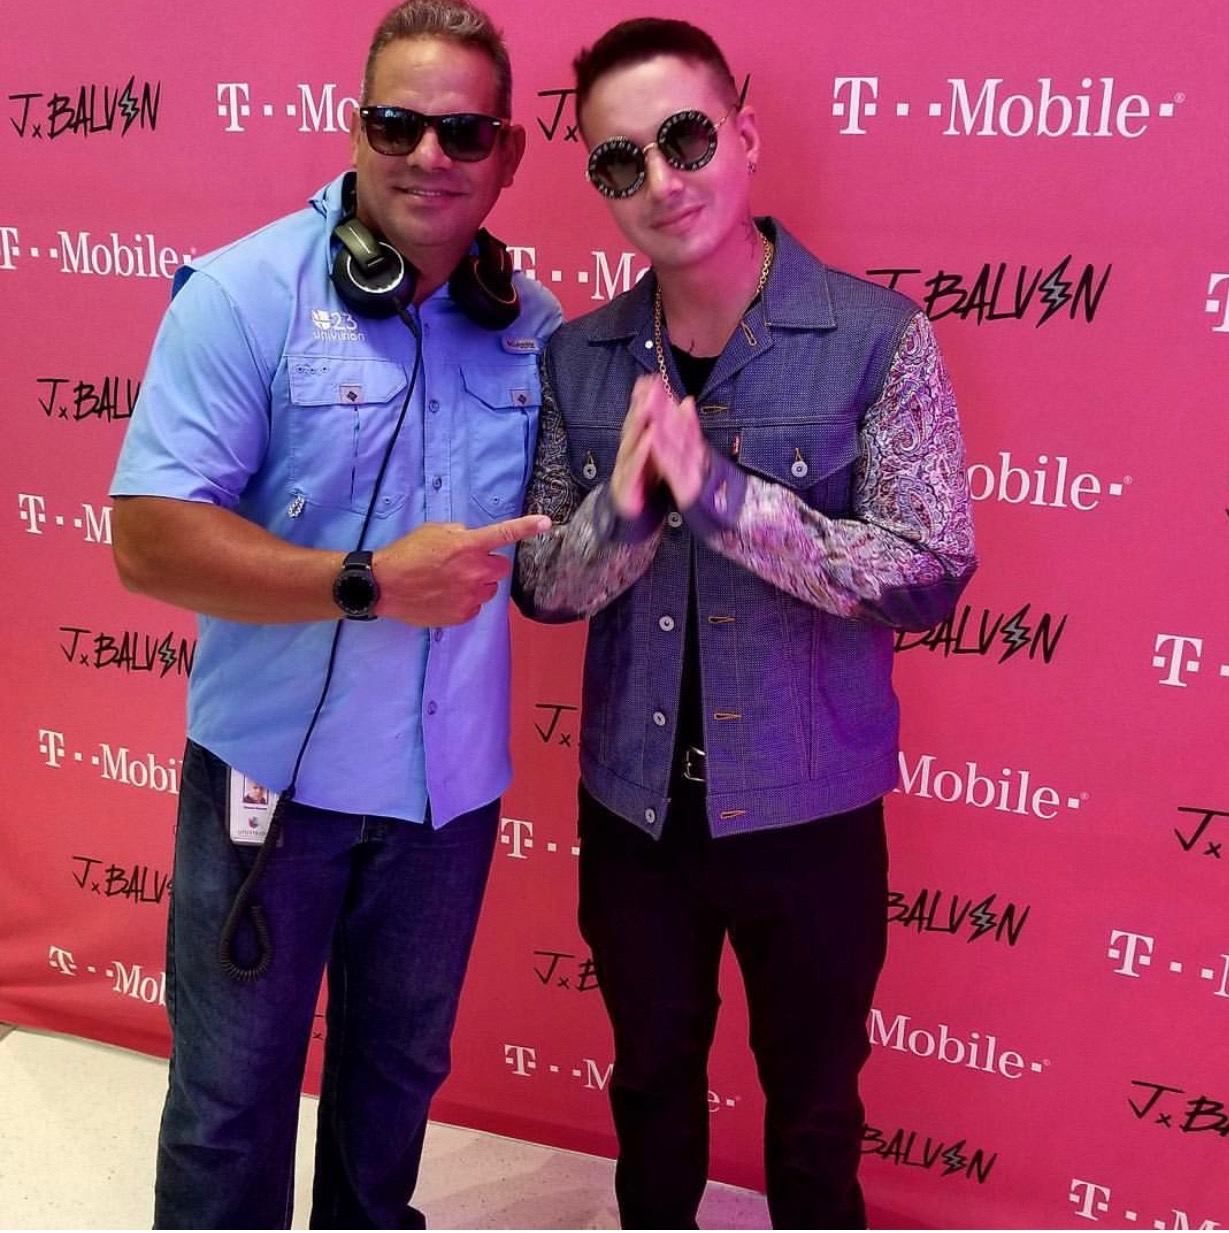 DJ Mani and J-Balvin